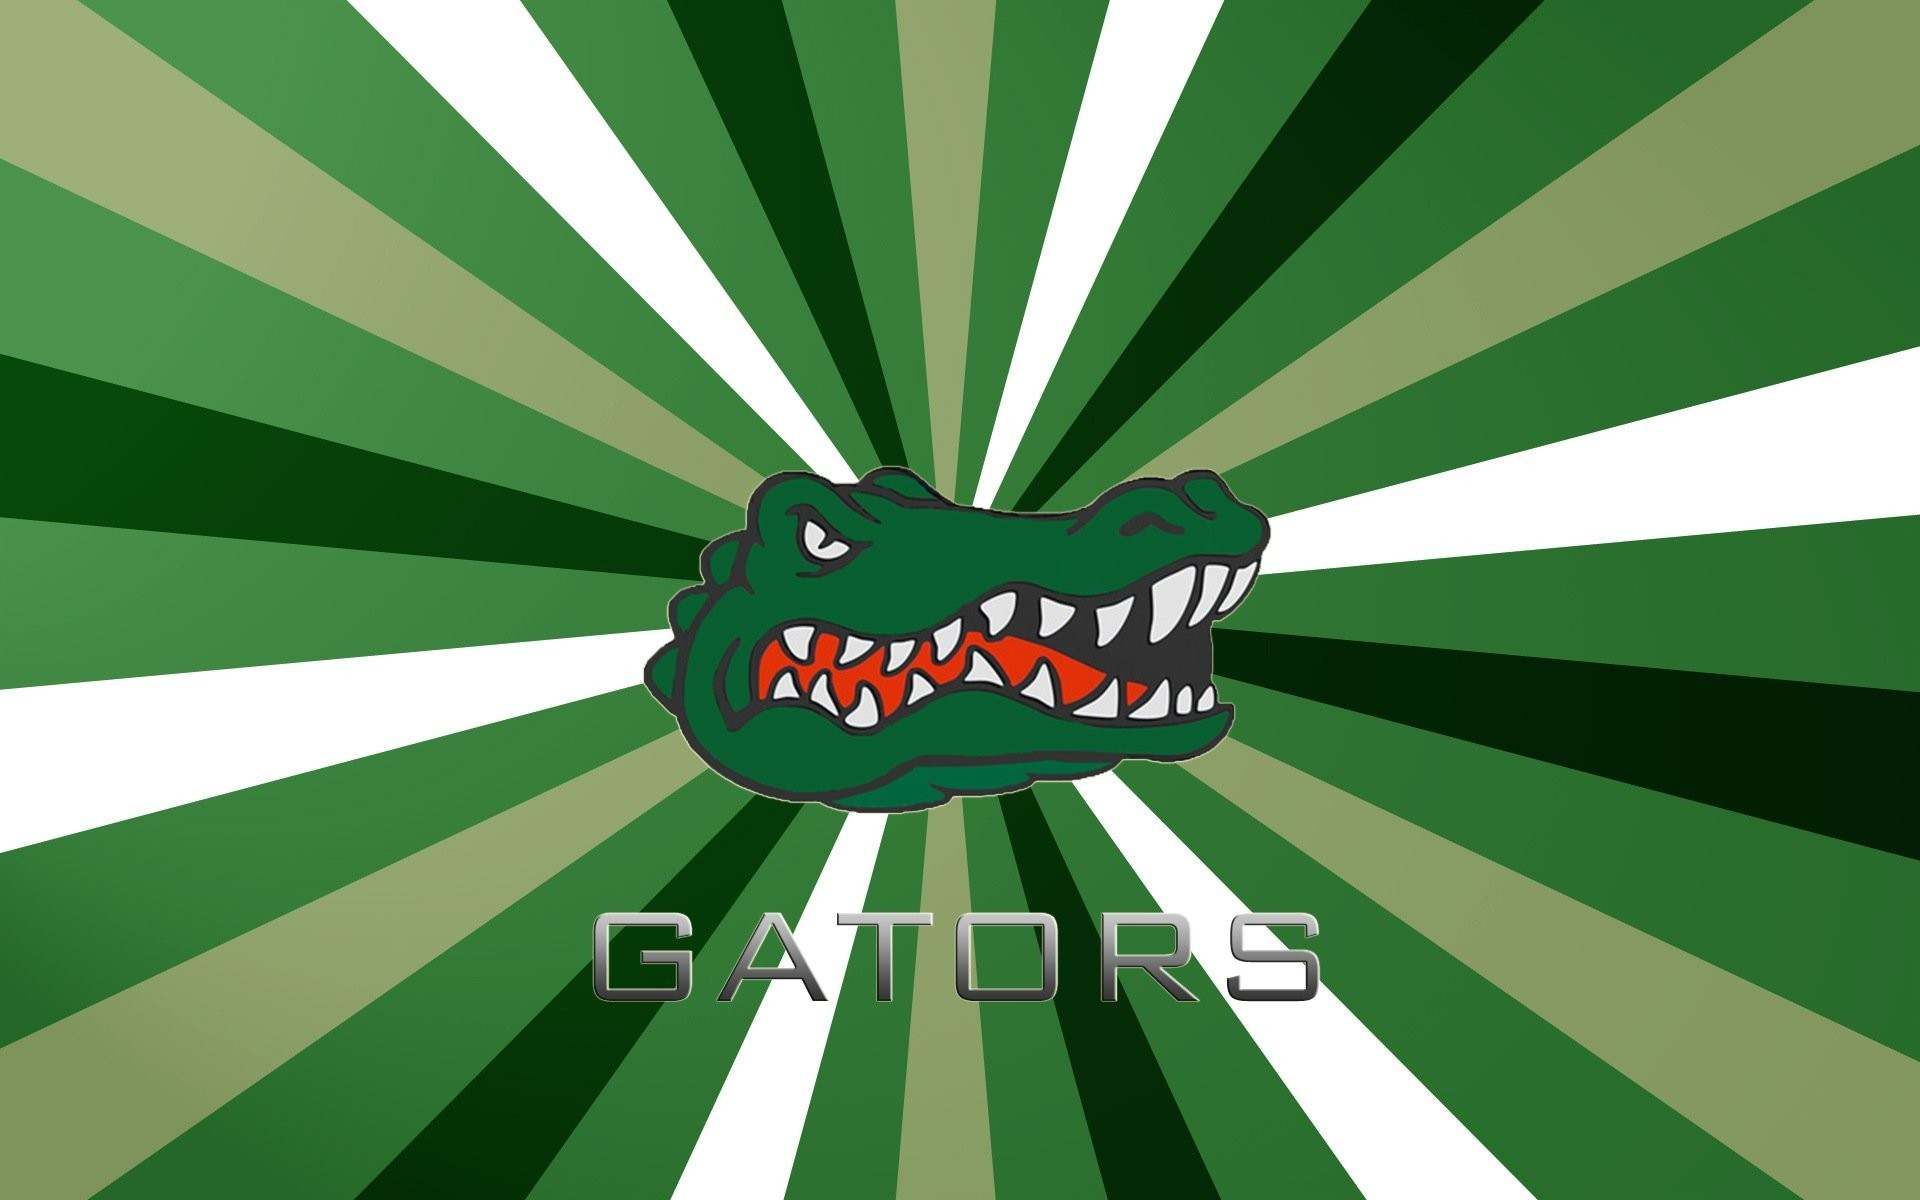 Florida Gators 650750